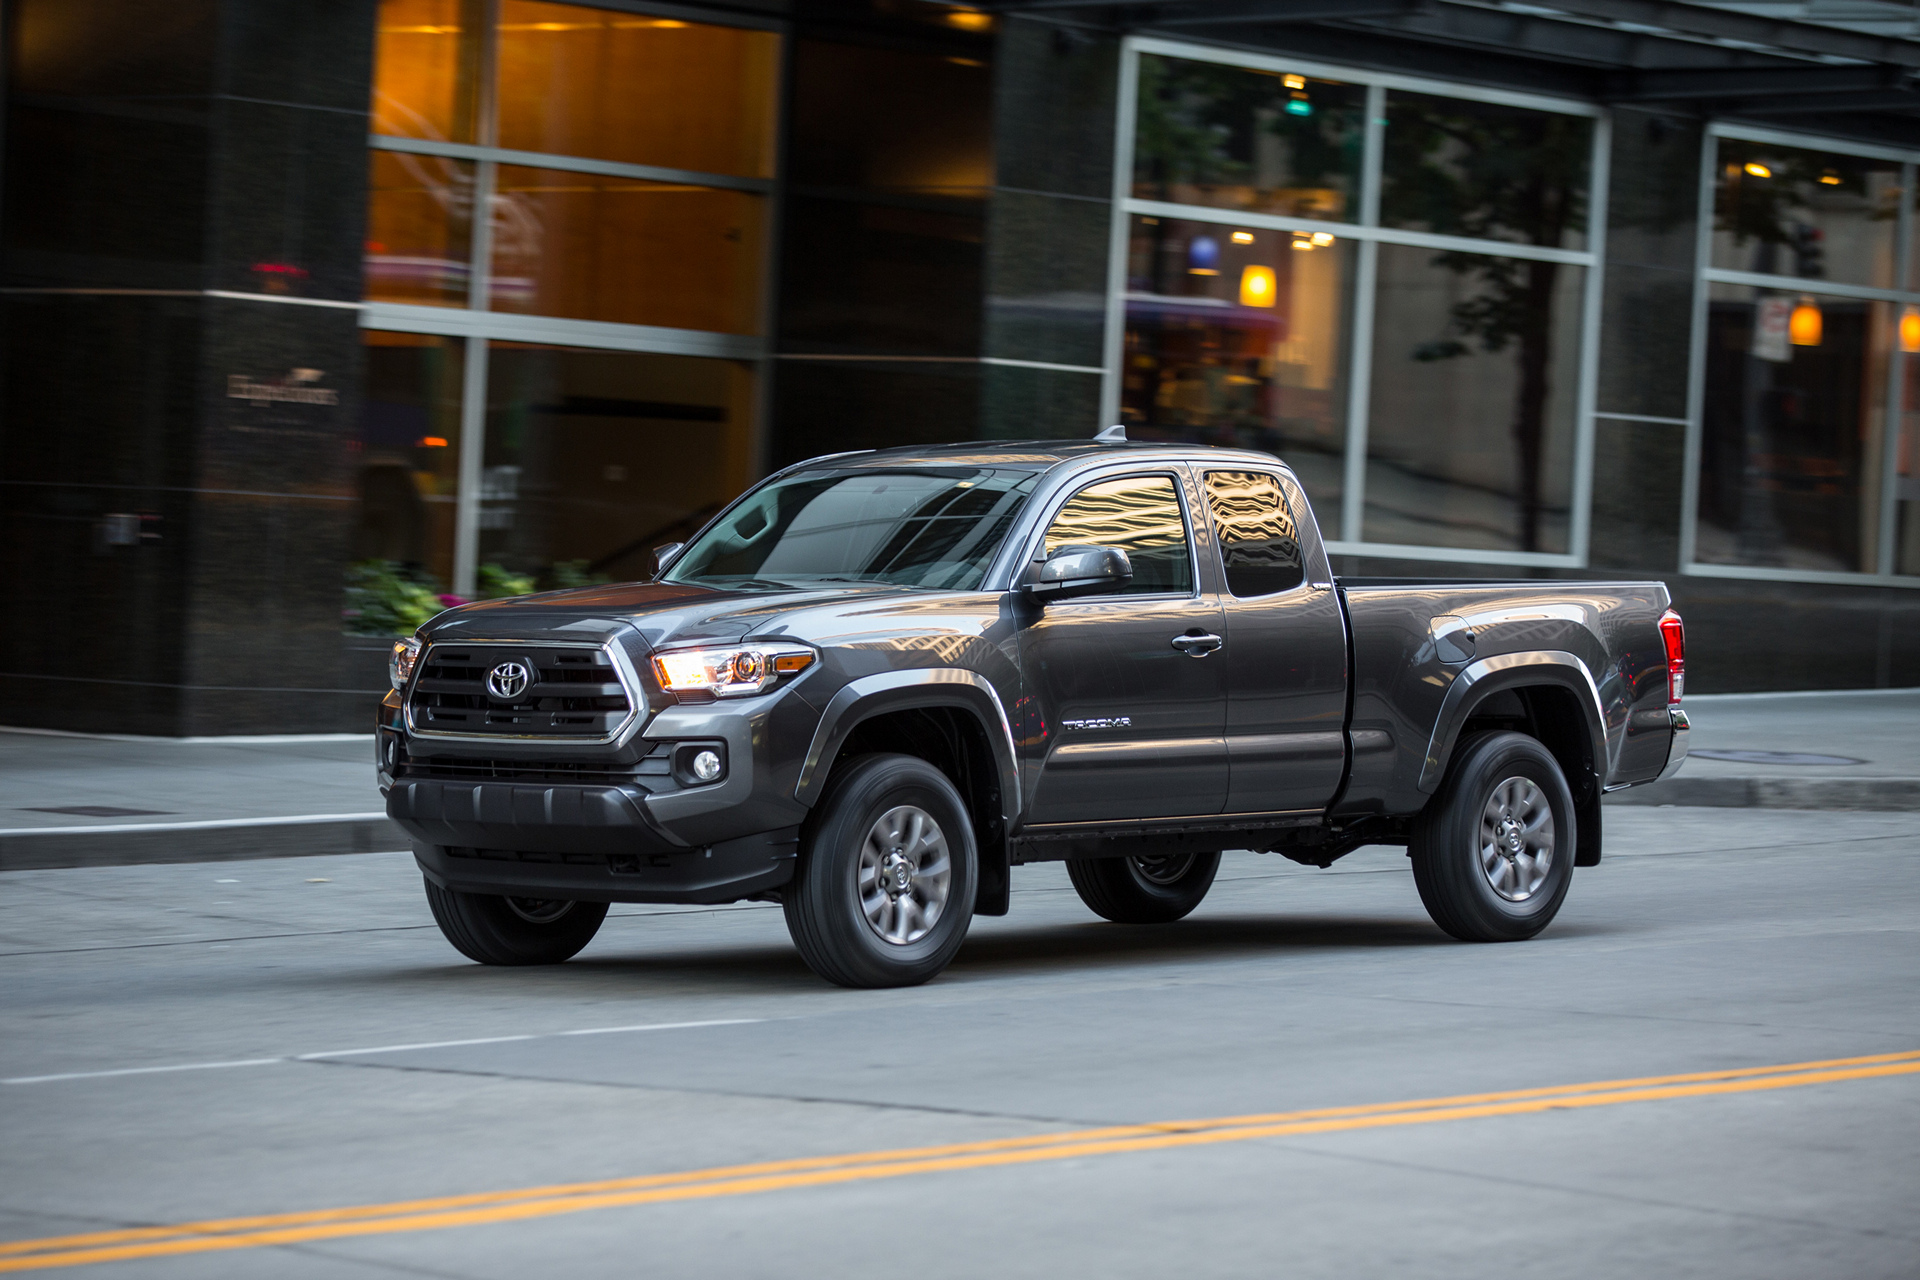 2016 Toyota Tacoma SR5 © Toyota Motor Corporation